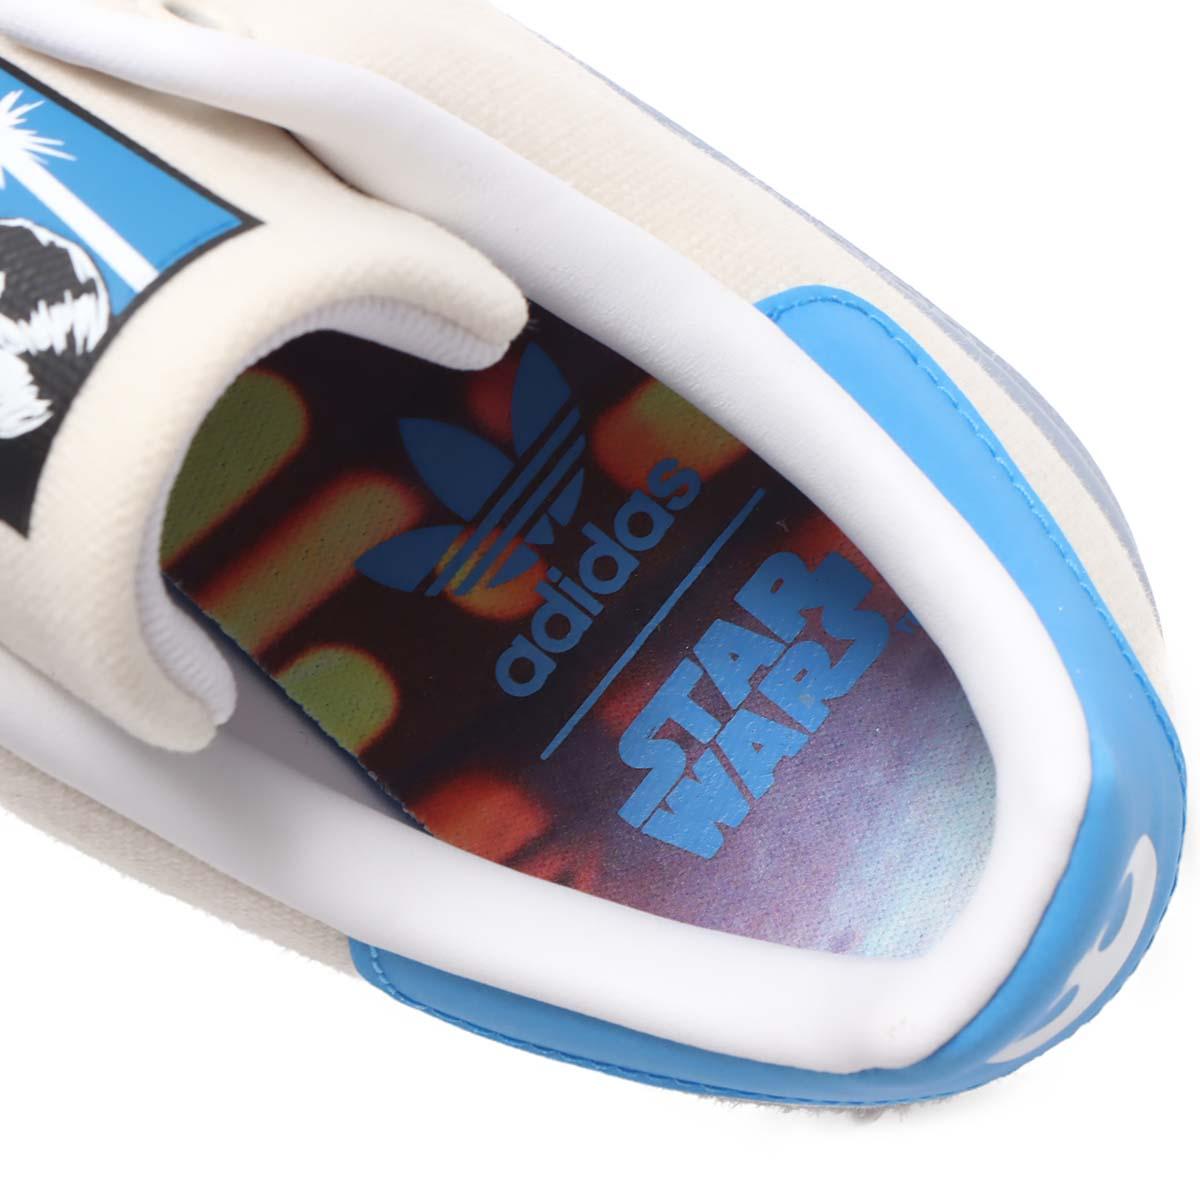 adidas STAN SMITH STAR WARS / LUKE SKYWALKER CHALK WHITE / FTWR WHITE / BRIGHT BLUE FX9306 アディダス スタンスミス スター・ウォーズ ルーク・スカイウォーカー ホワイト/ブルー